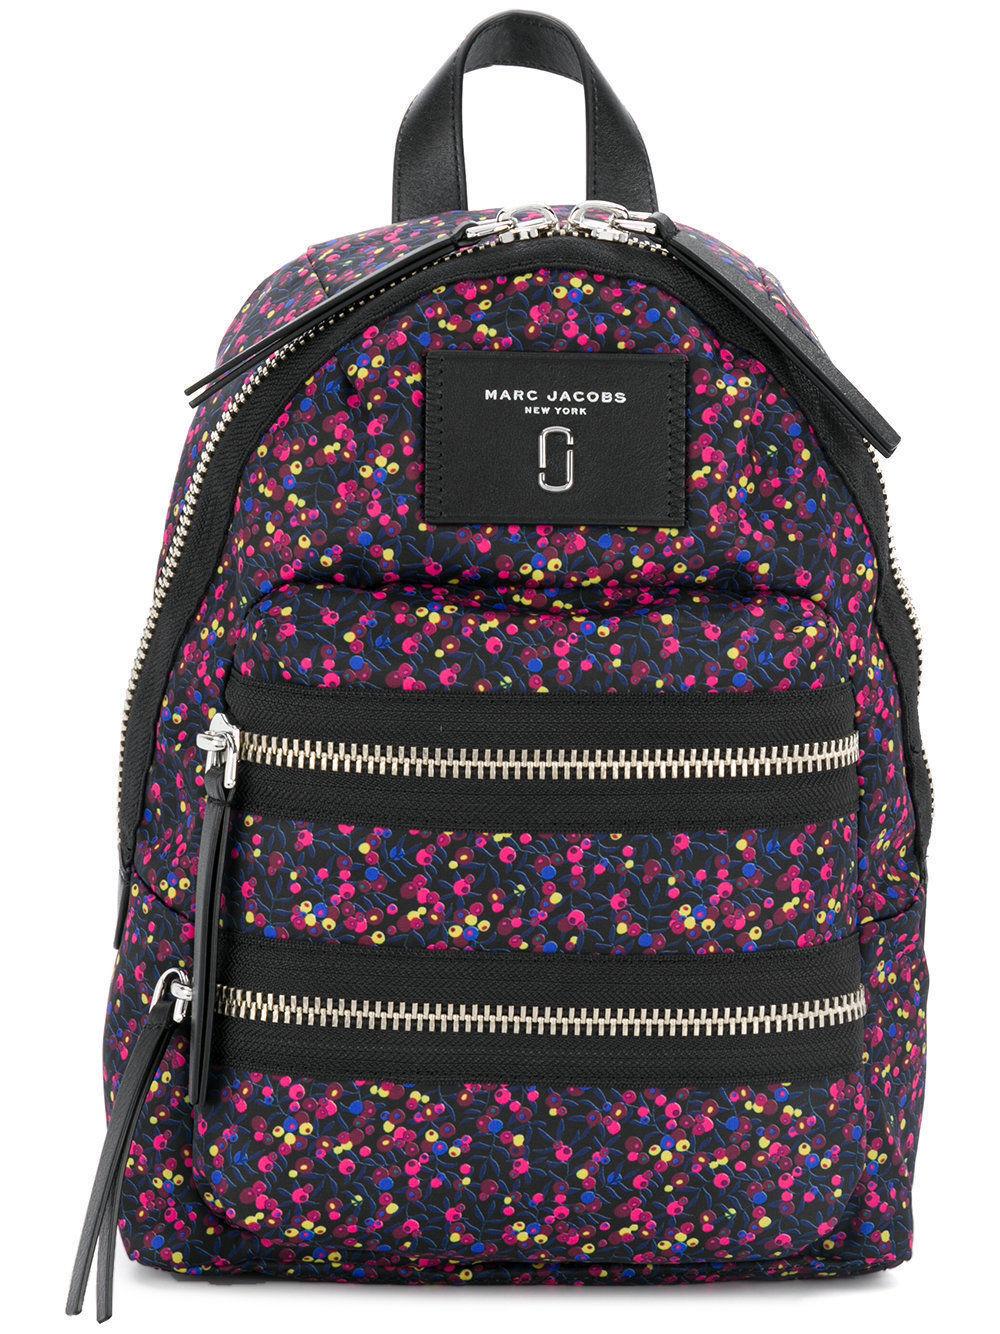 7977572cef1 Marc Jacobs Mixed Berries Nylon Mini Biker Backpack Blue BLK Pink ...